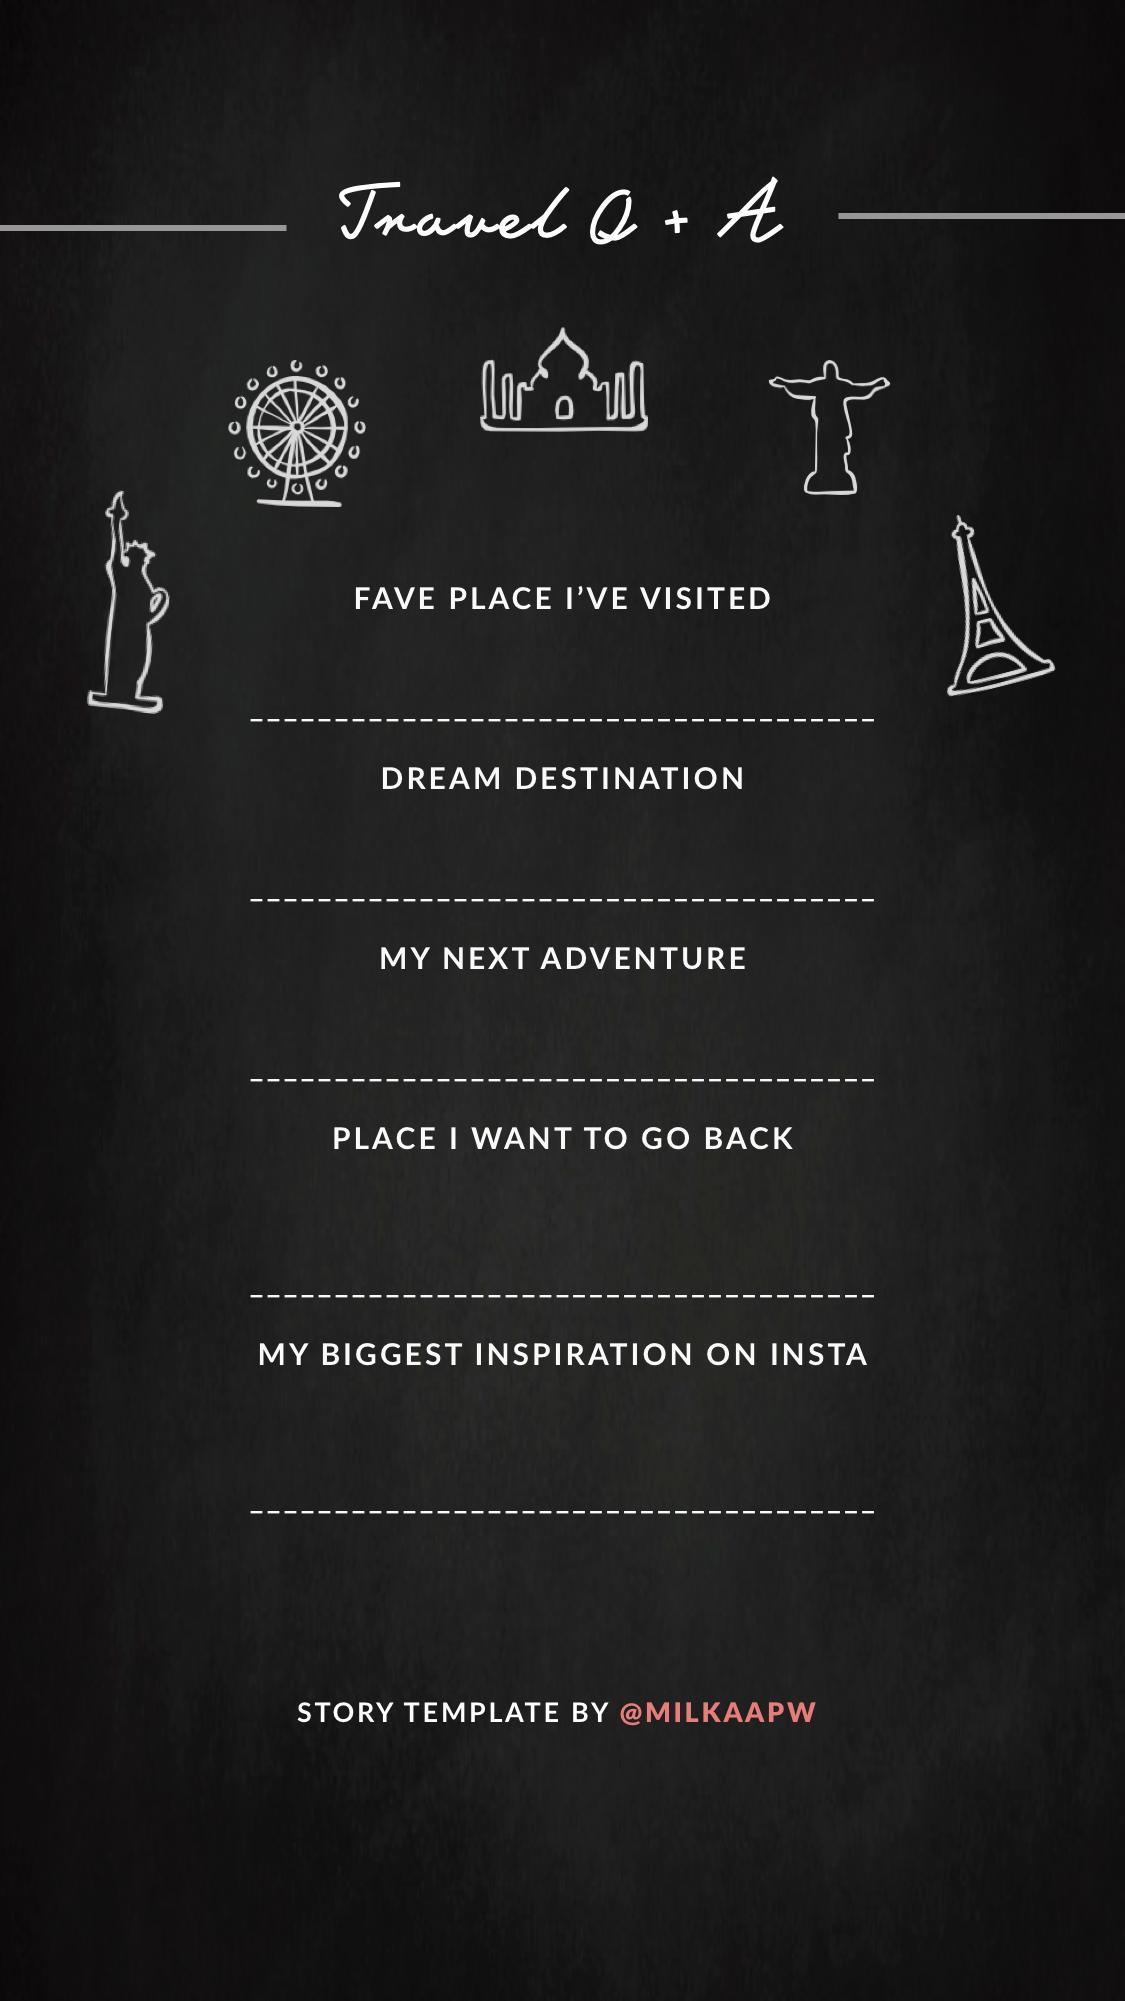 Travel Q + A | Instagram Story Q & A Template | Pinterest